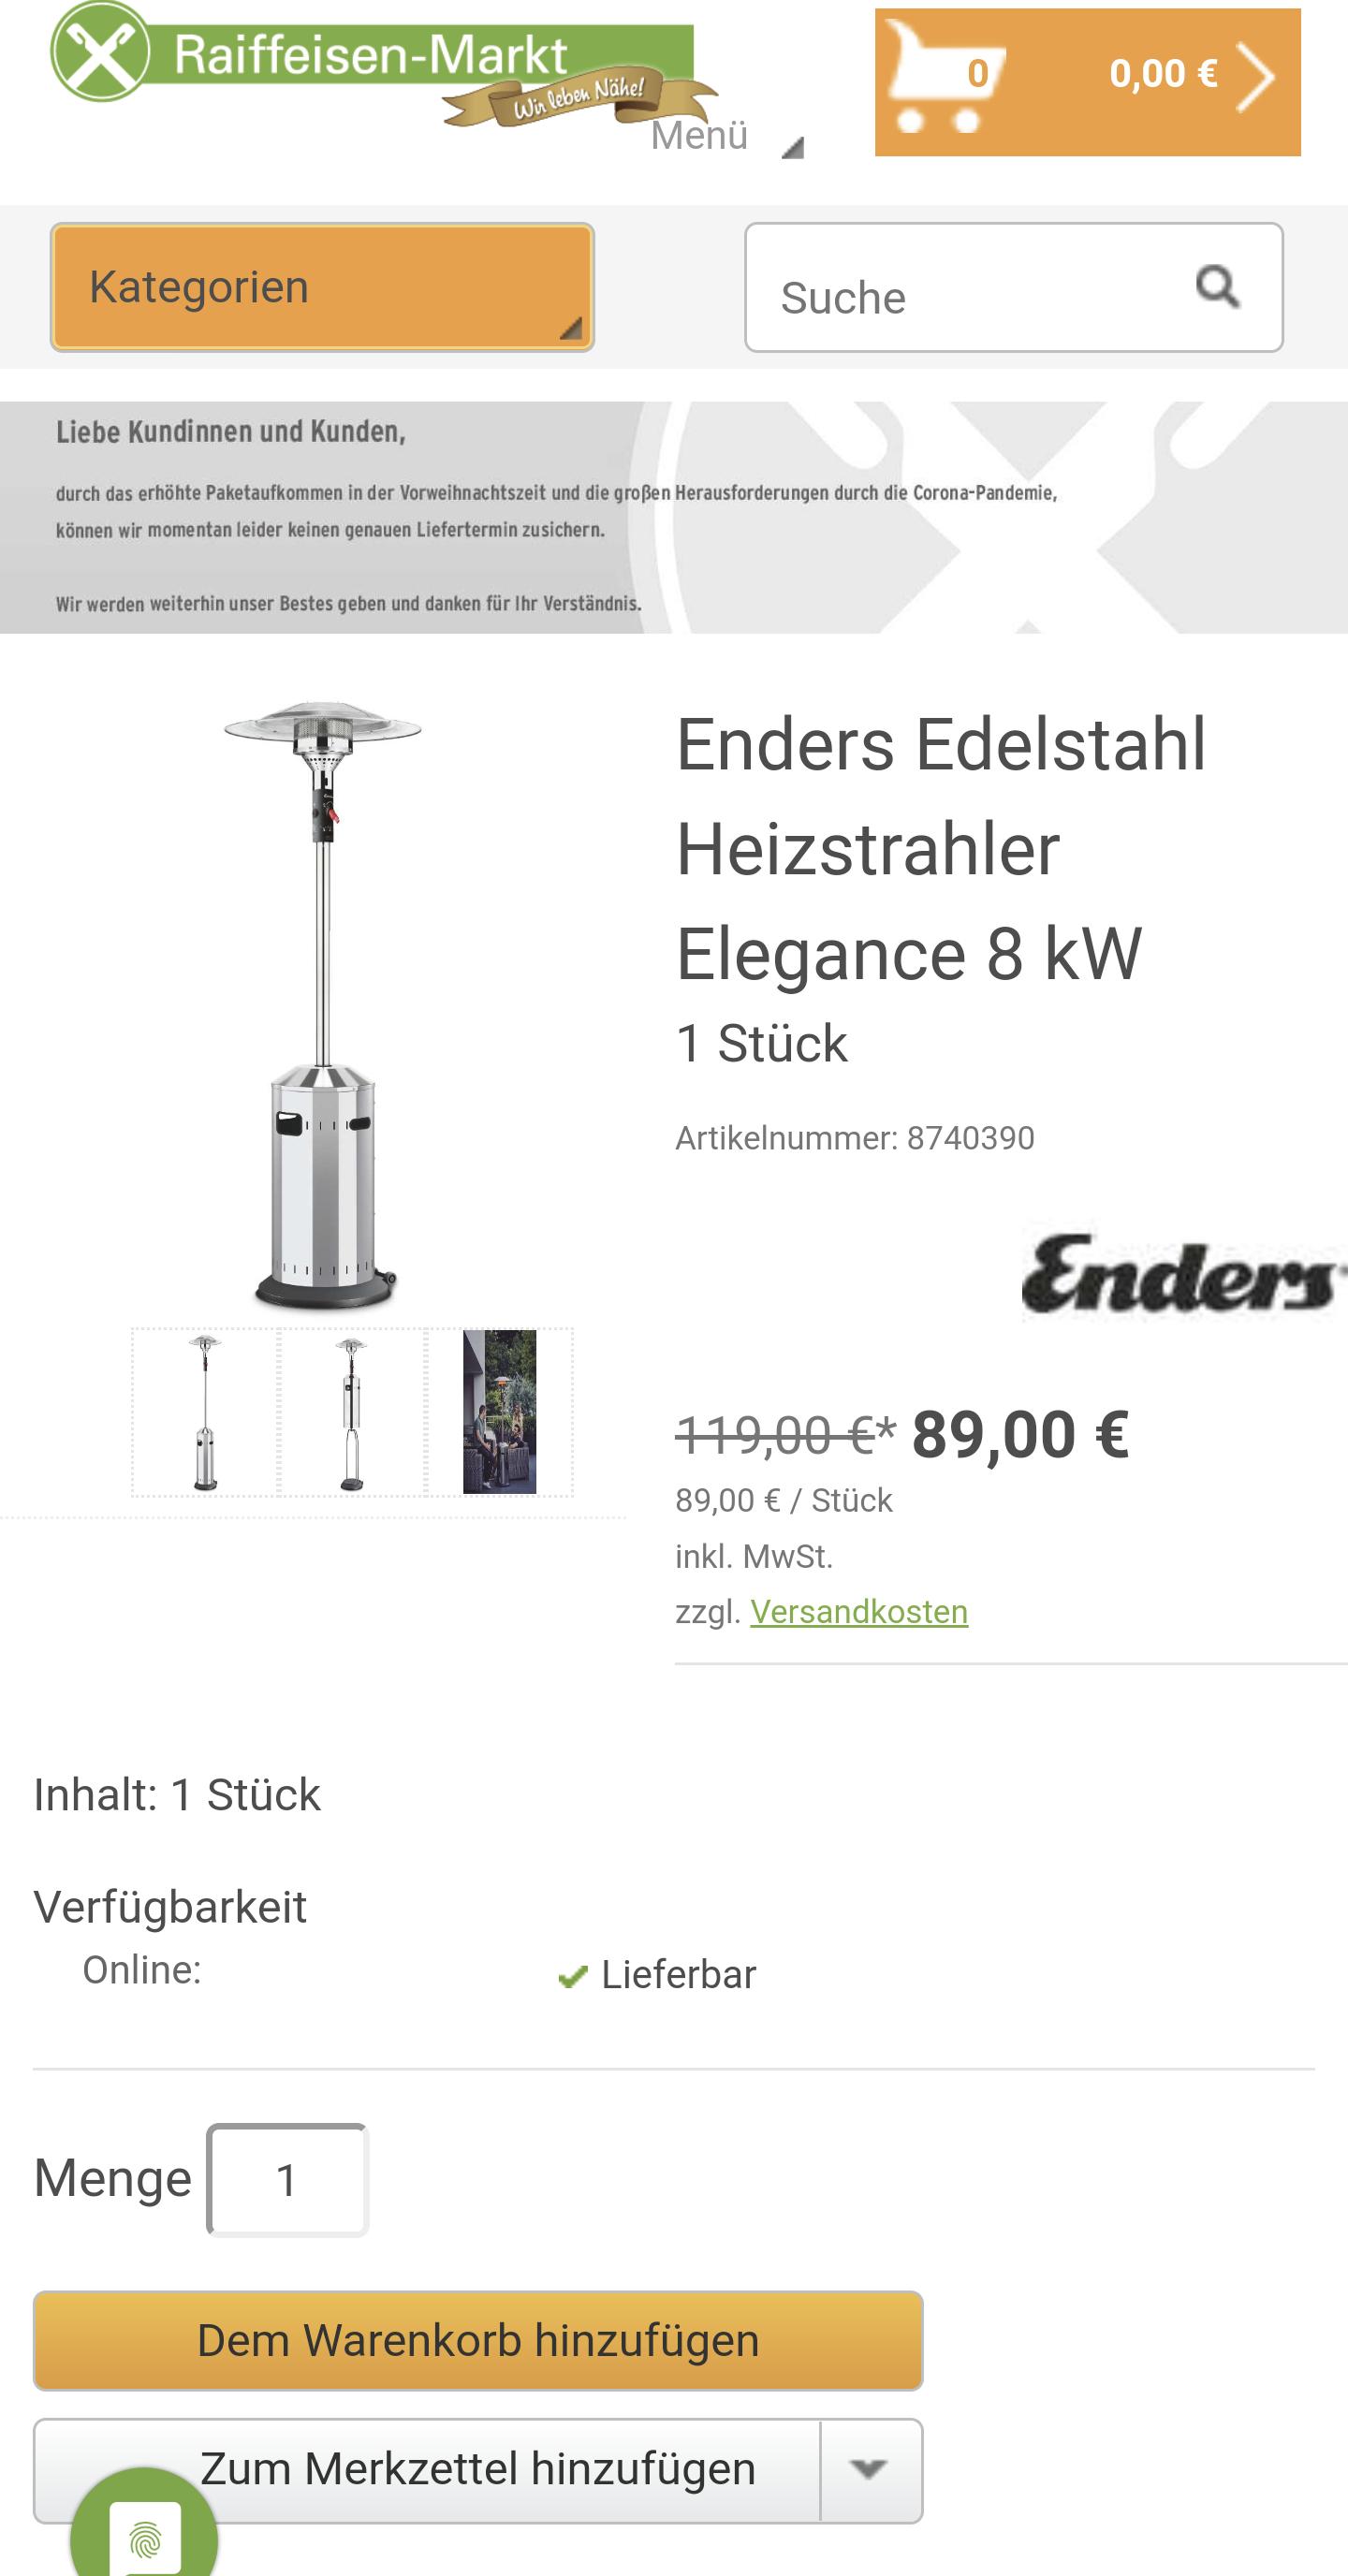 Enders Elegance 8KW Heizpilz Raiffeisen-Markt